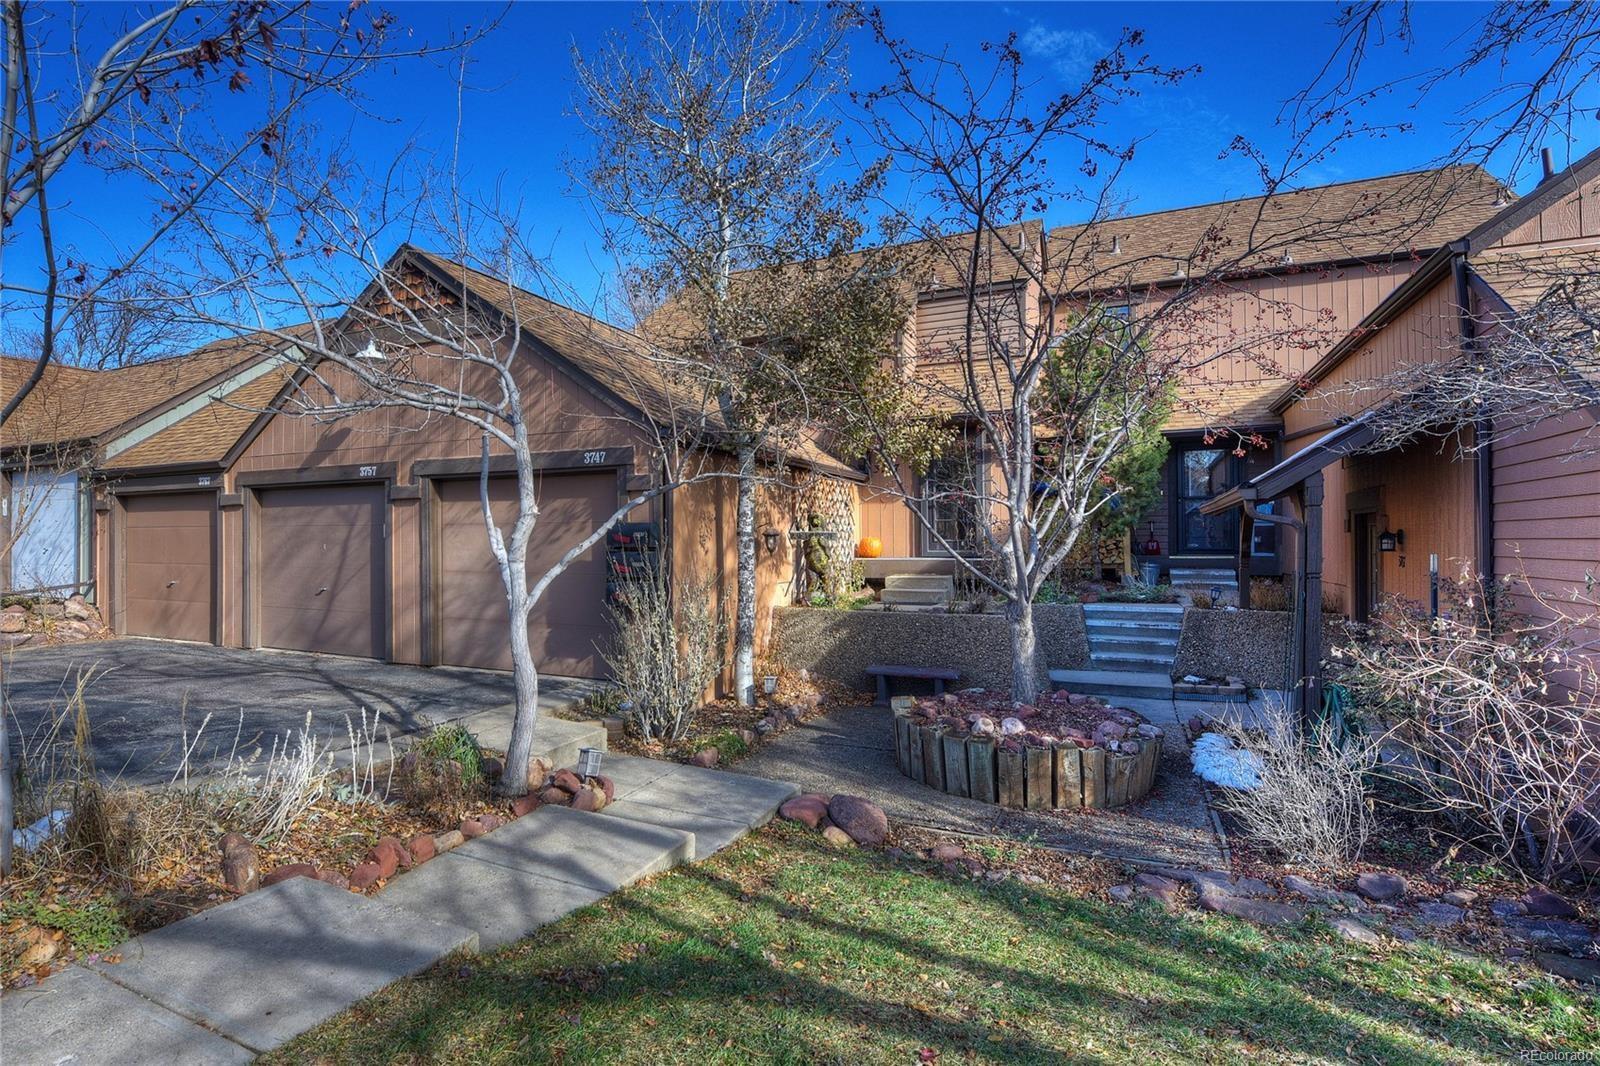 MLS# 6826635 - 1 - 3747 Telluride Circle, Boulder, CO 80305